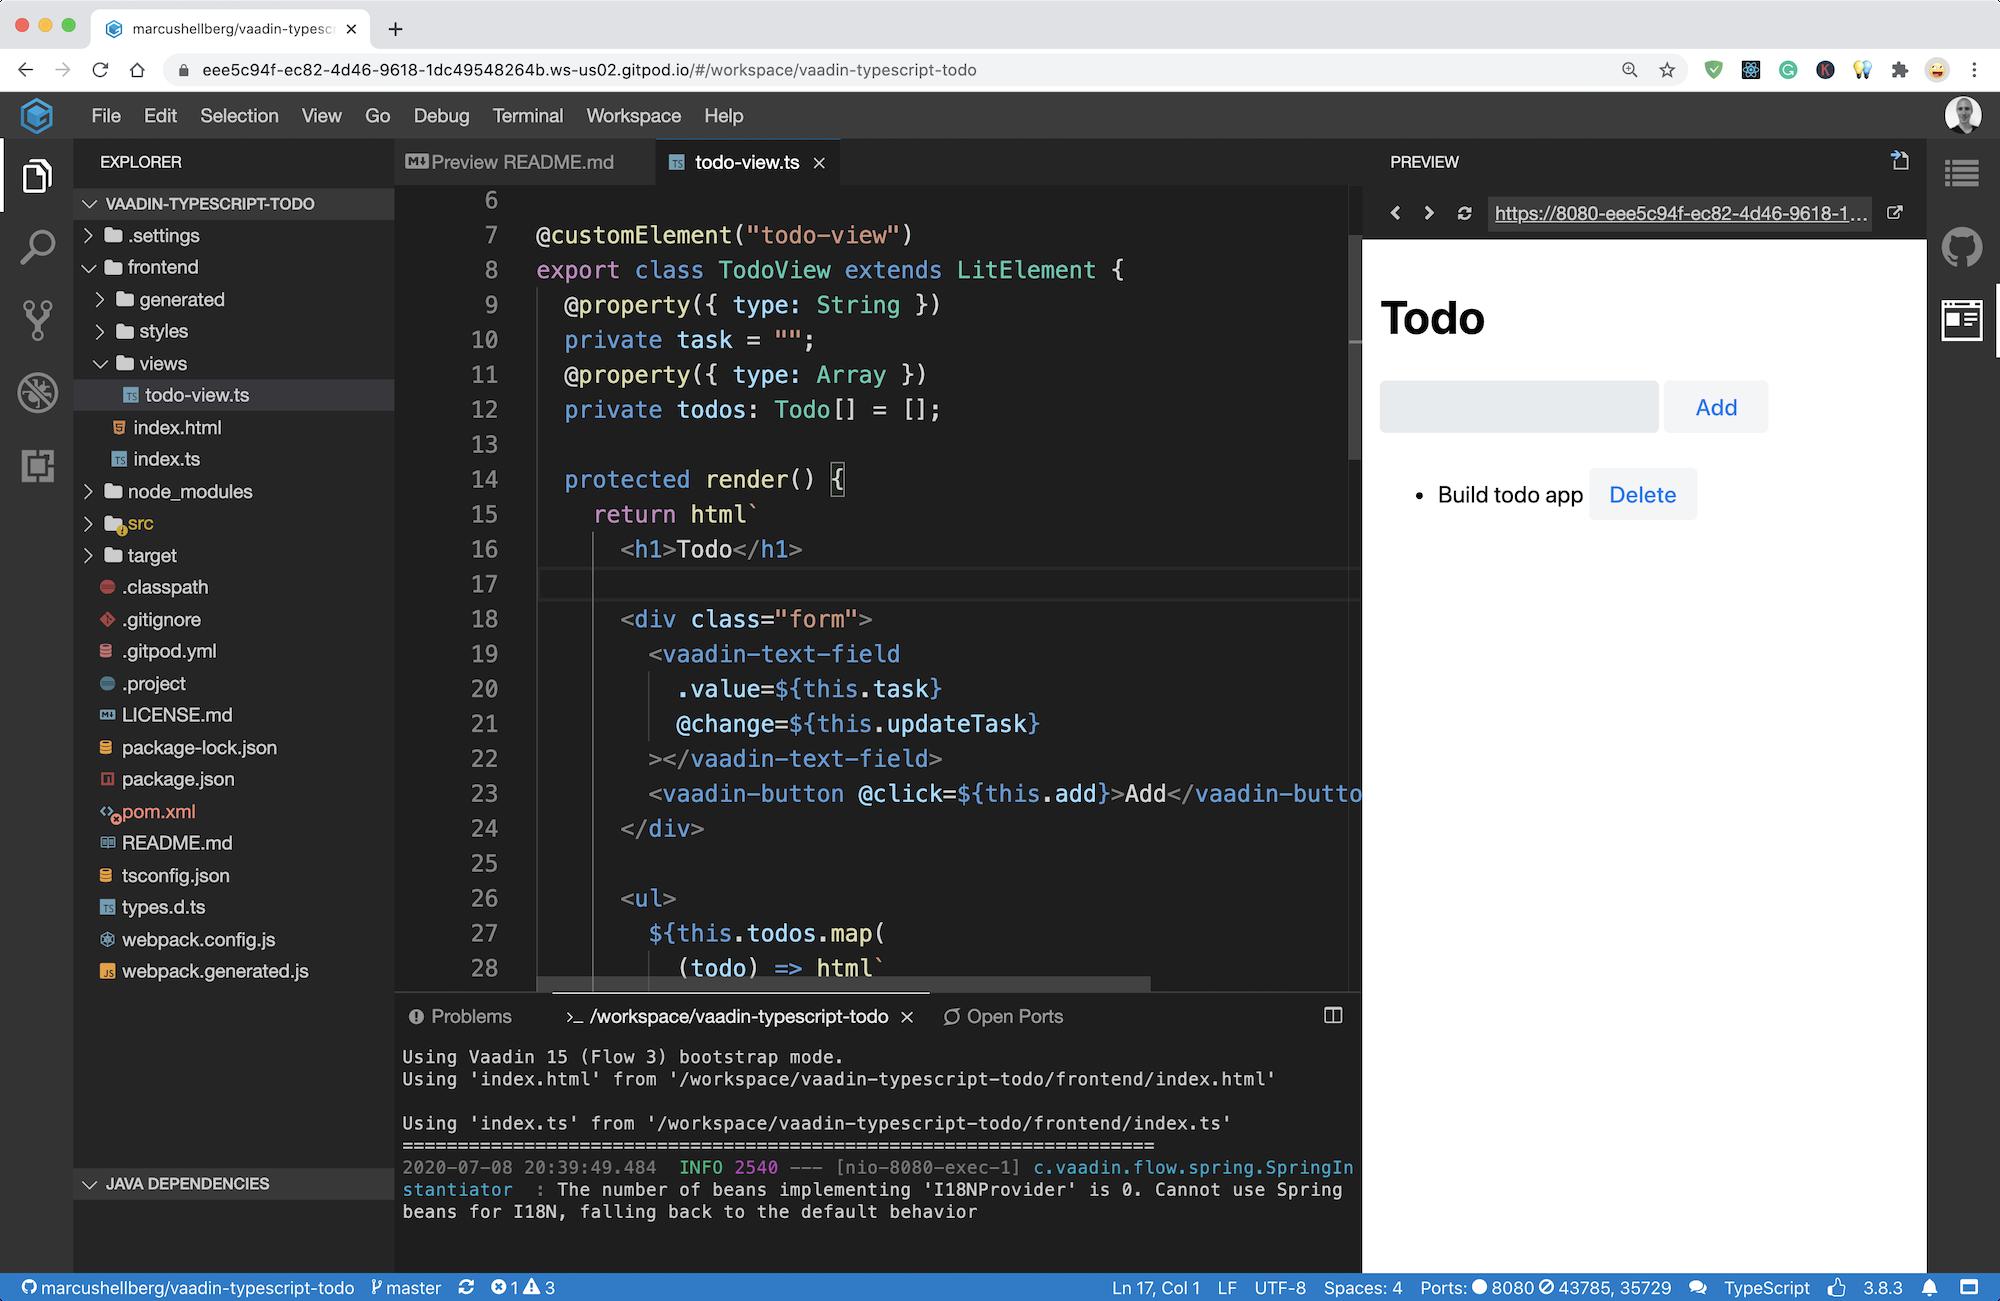 A todo application written with Vaadin's TypeScript based views running in GitPod, an online IDE